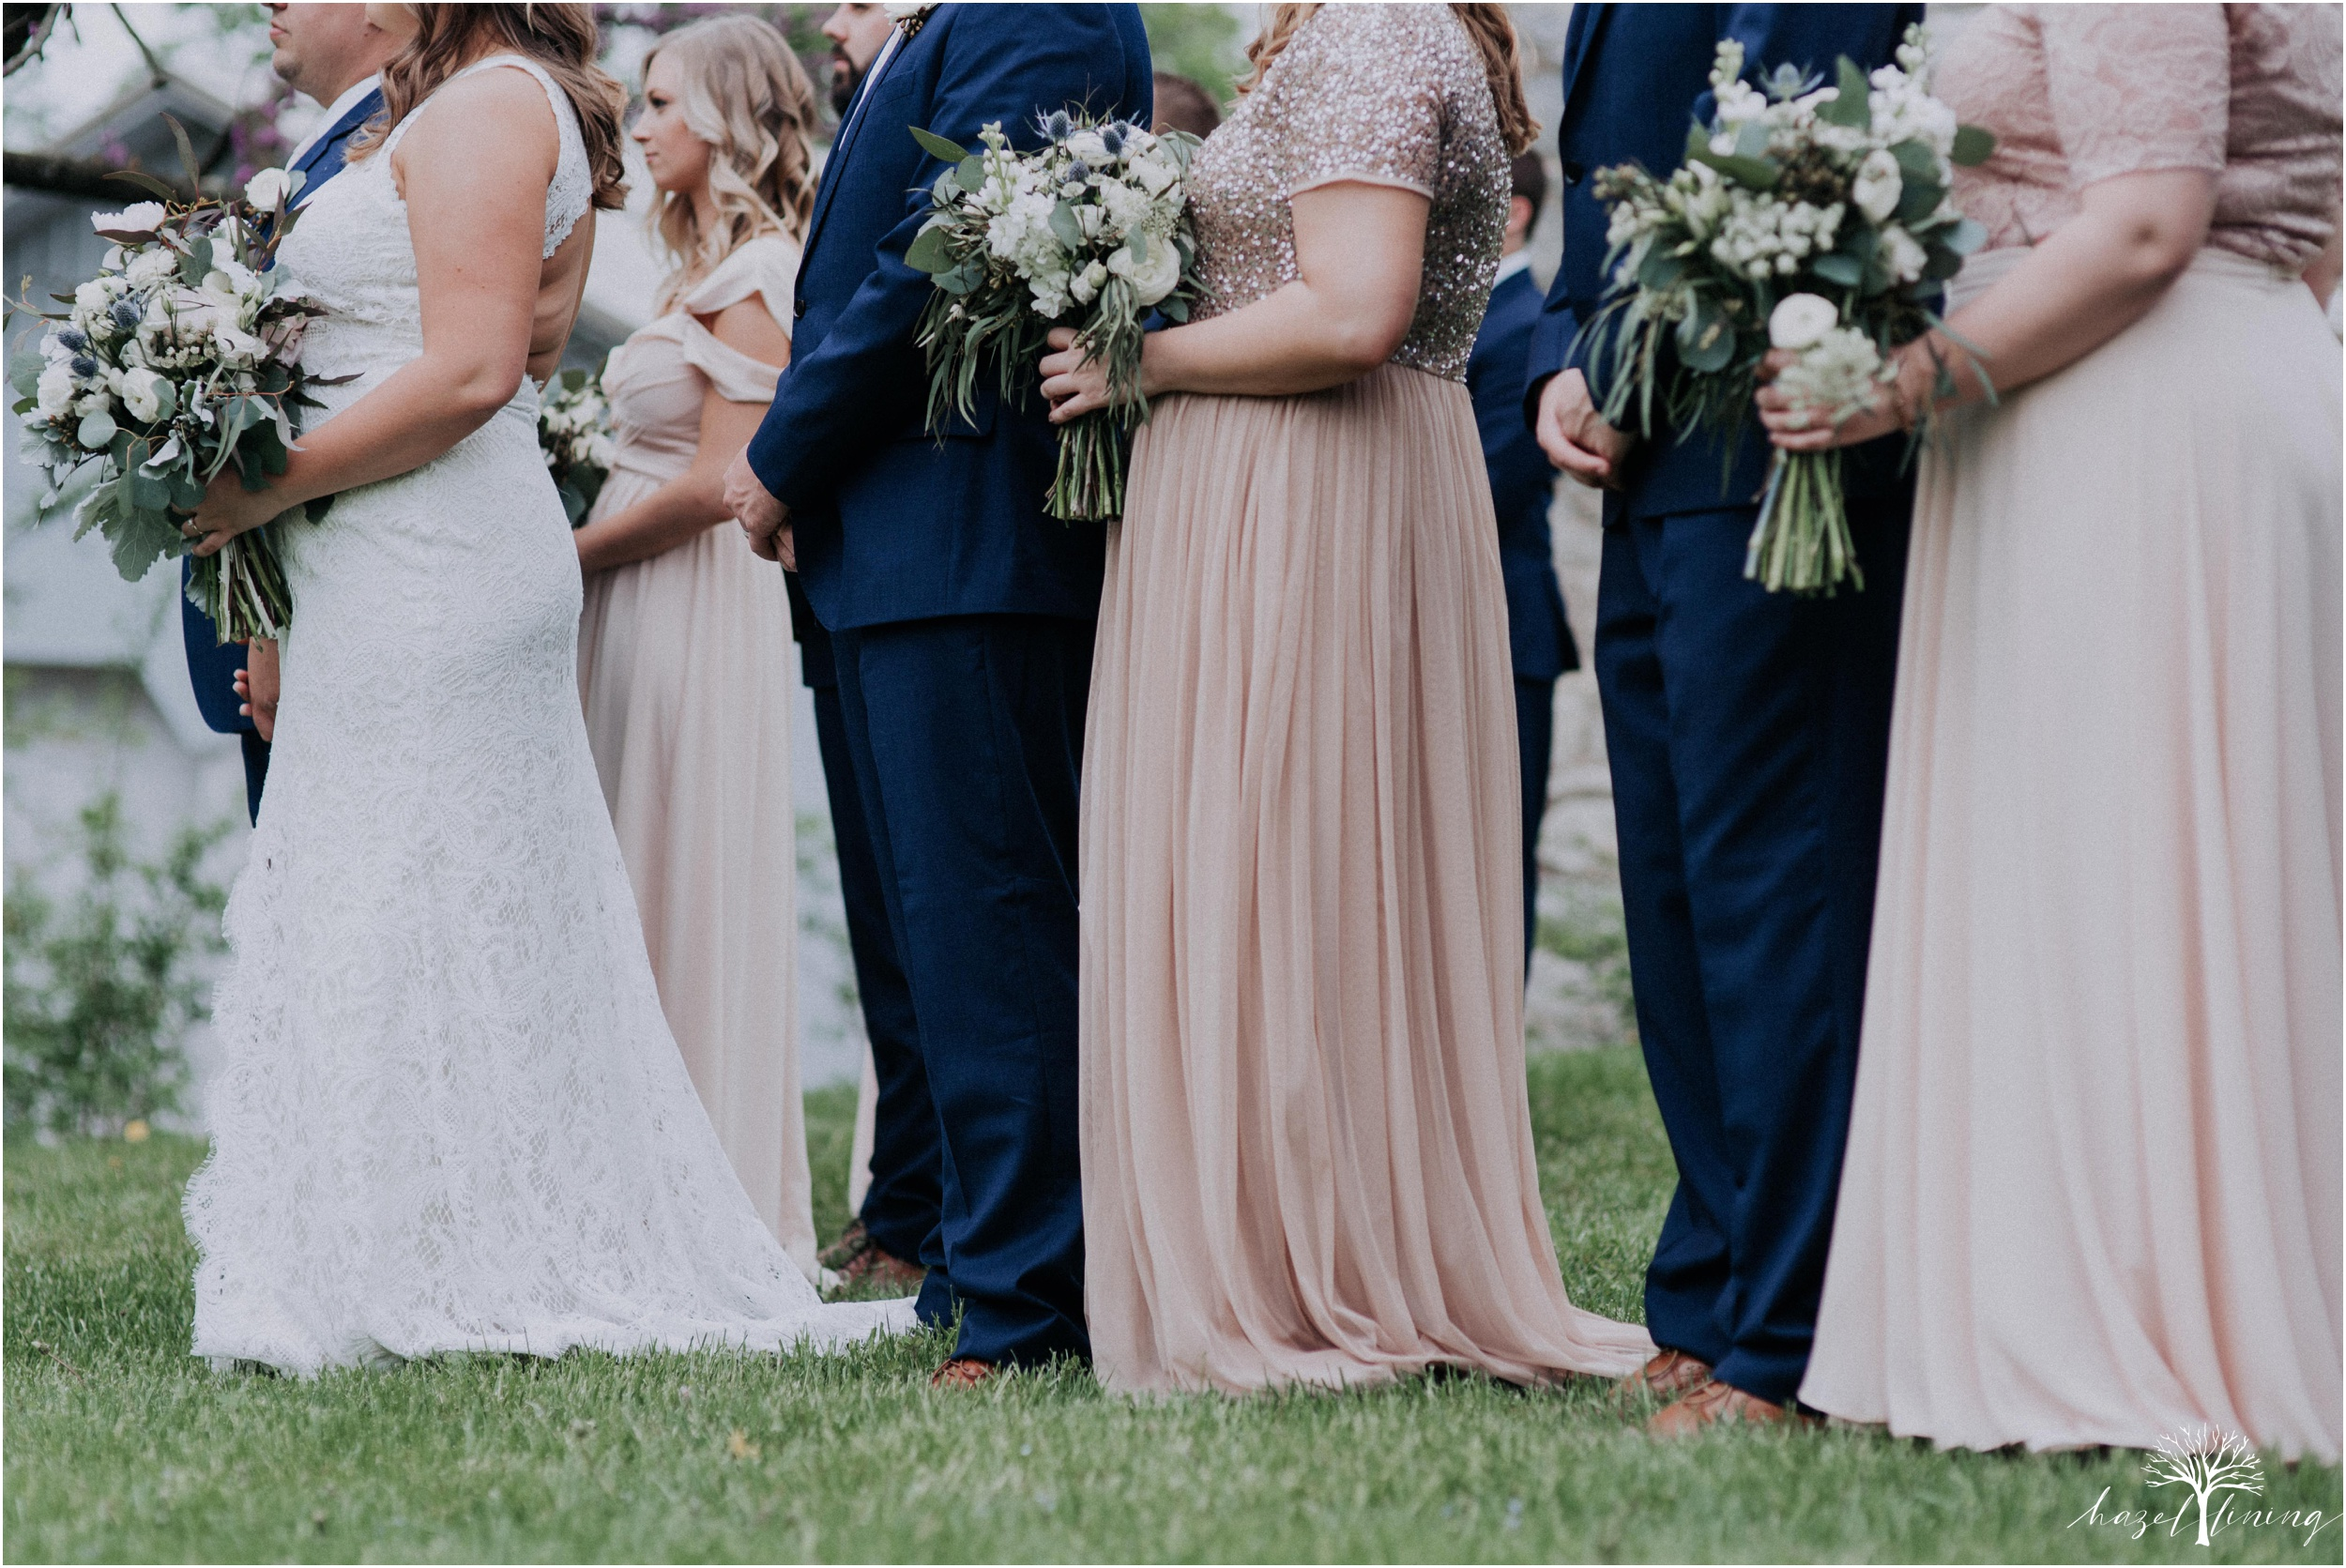 hazel-lining-travel-wedding-elopement-photography-abby-skyler-hunt-the-willis-house-york-pennsylvania-outdoor-estate-wedding_0066.jpg